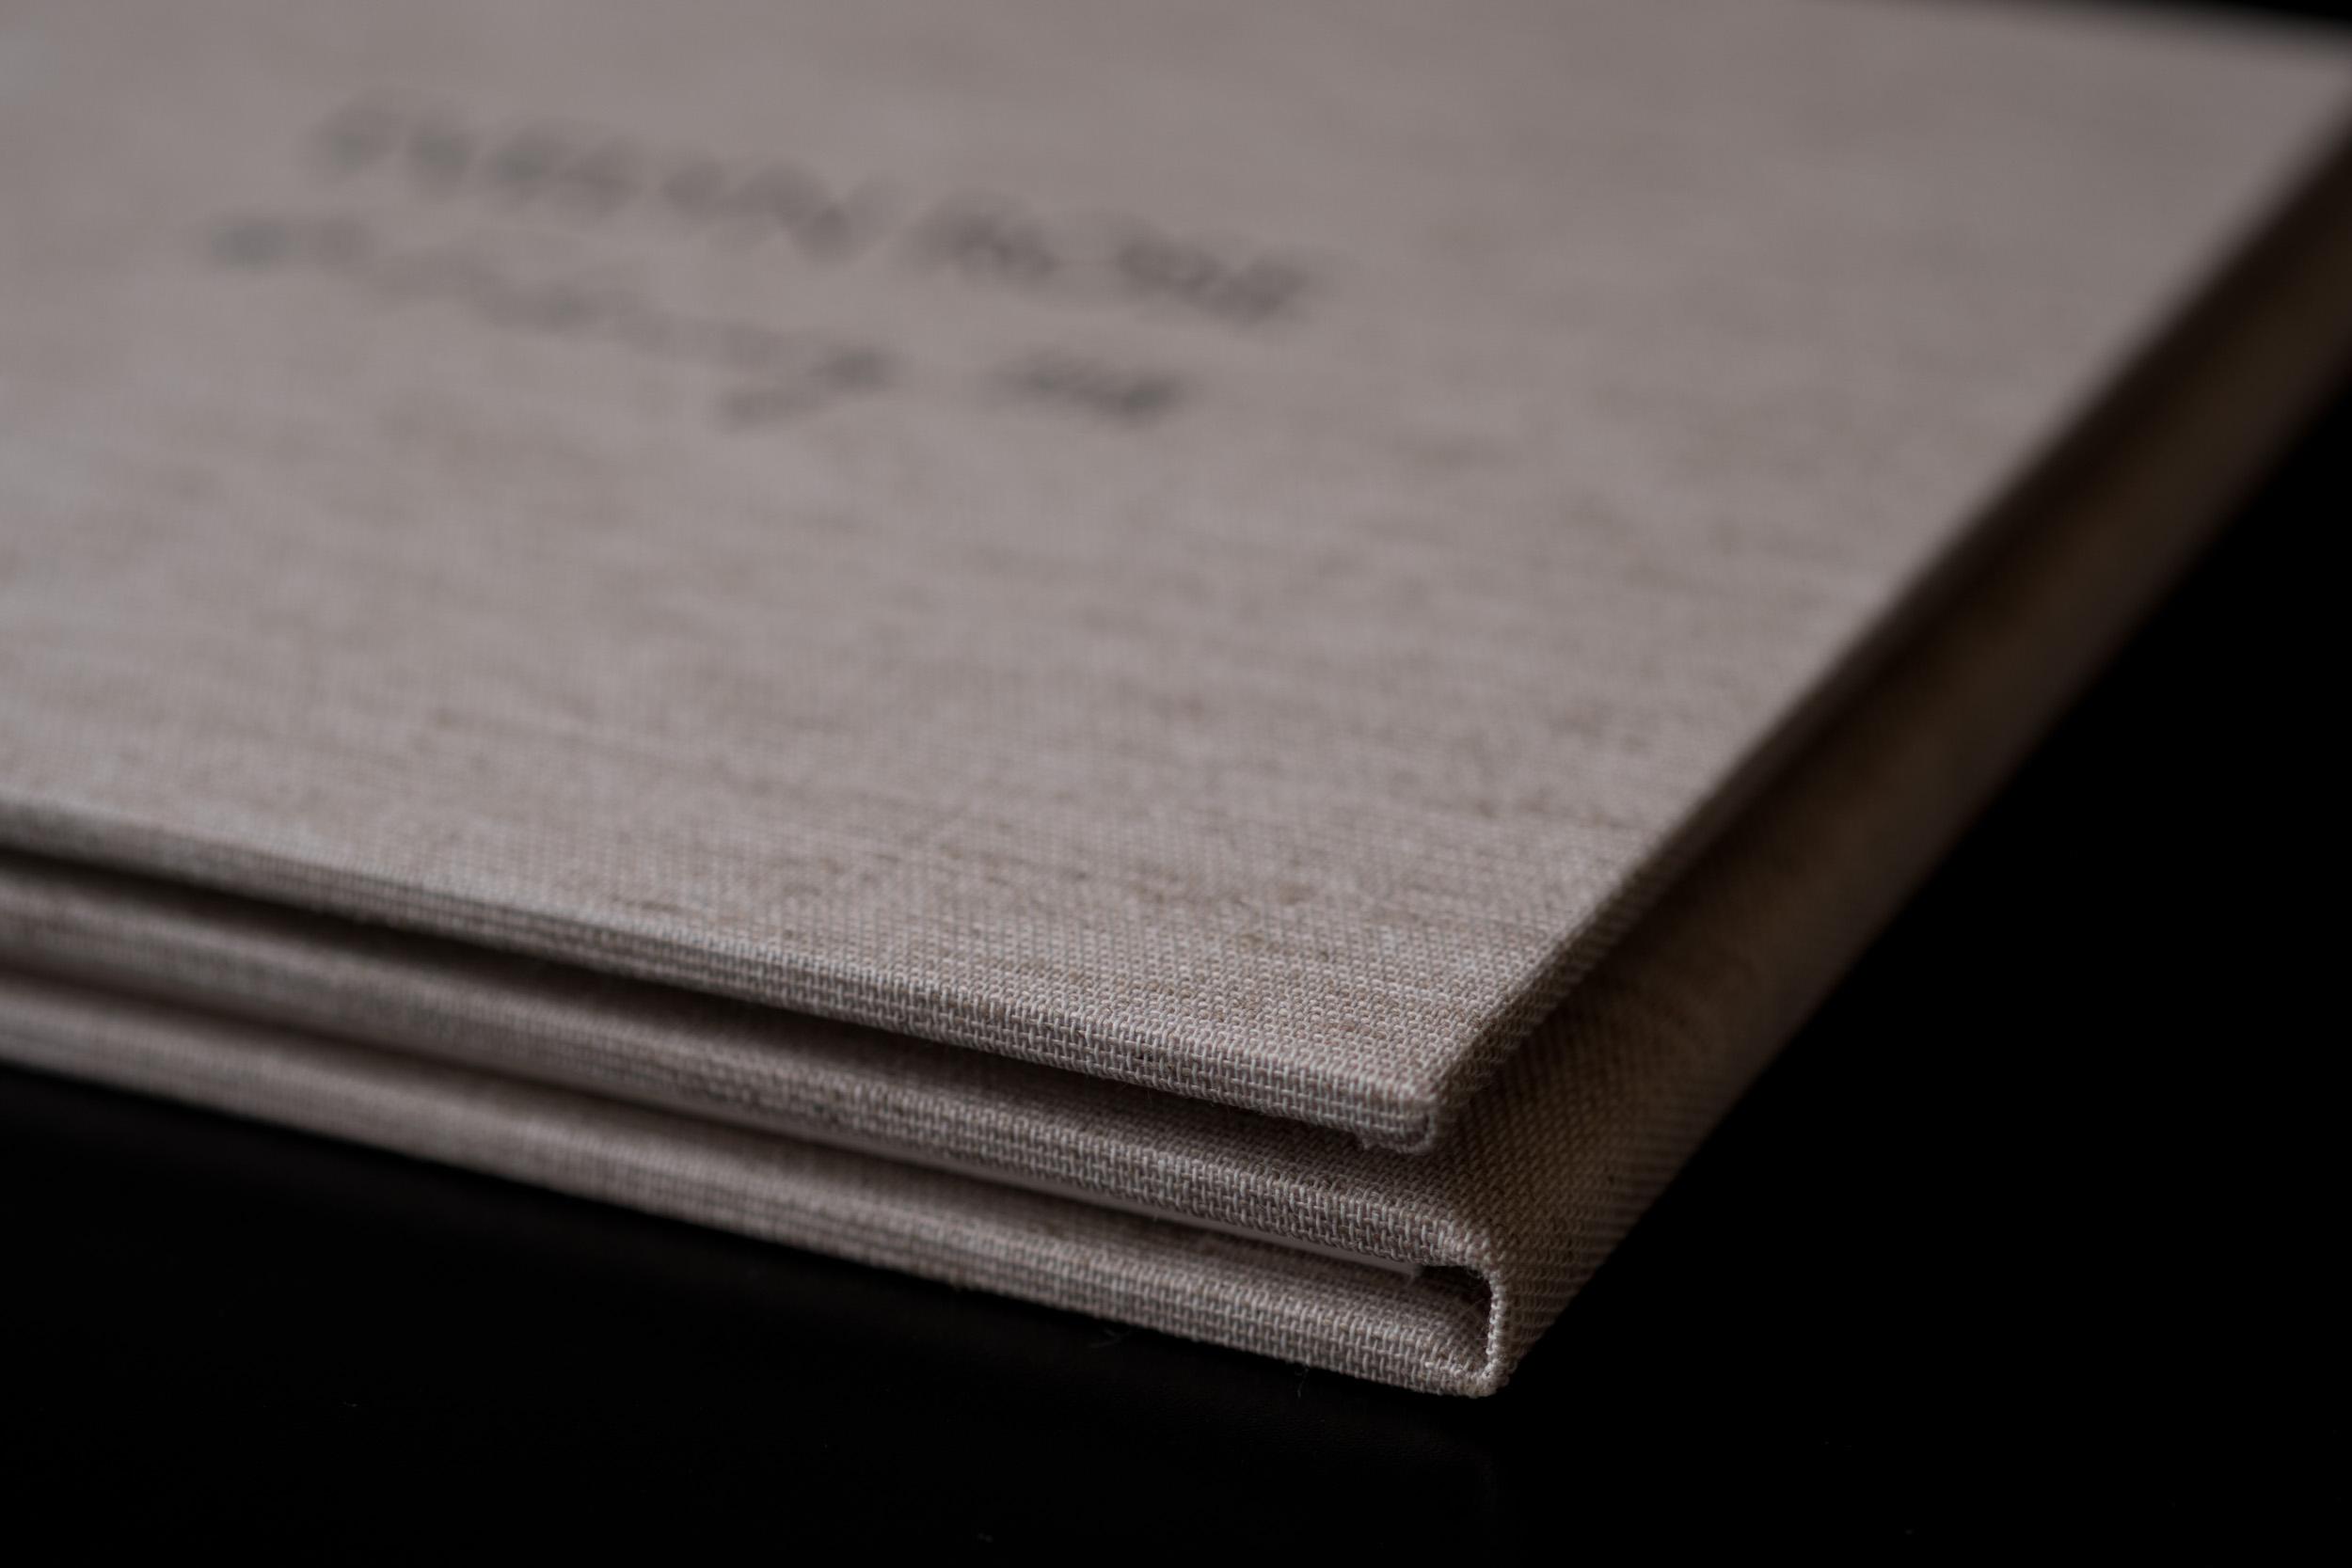 Newborn-Photography-Lincoln-Trio-Display-Folio-002.jpg